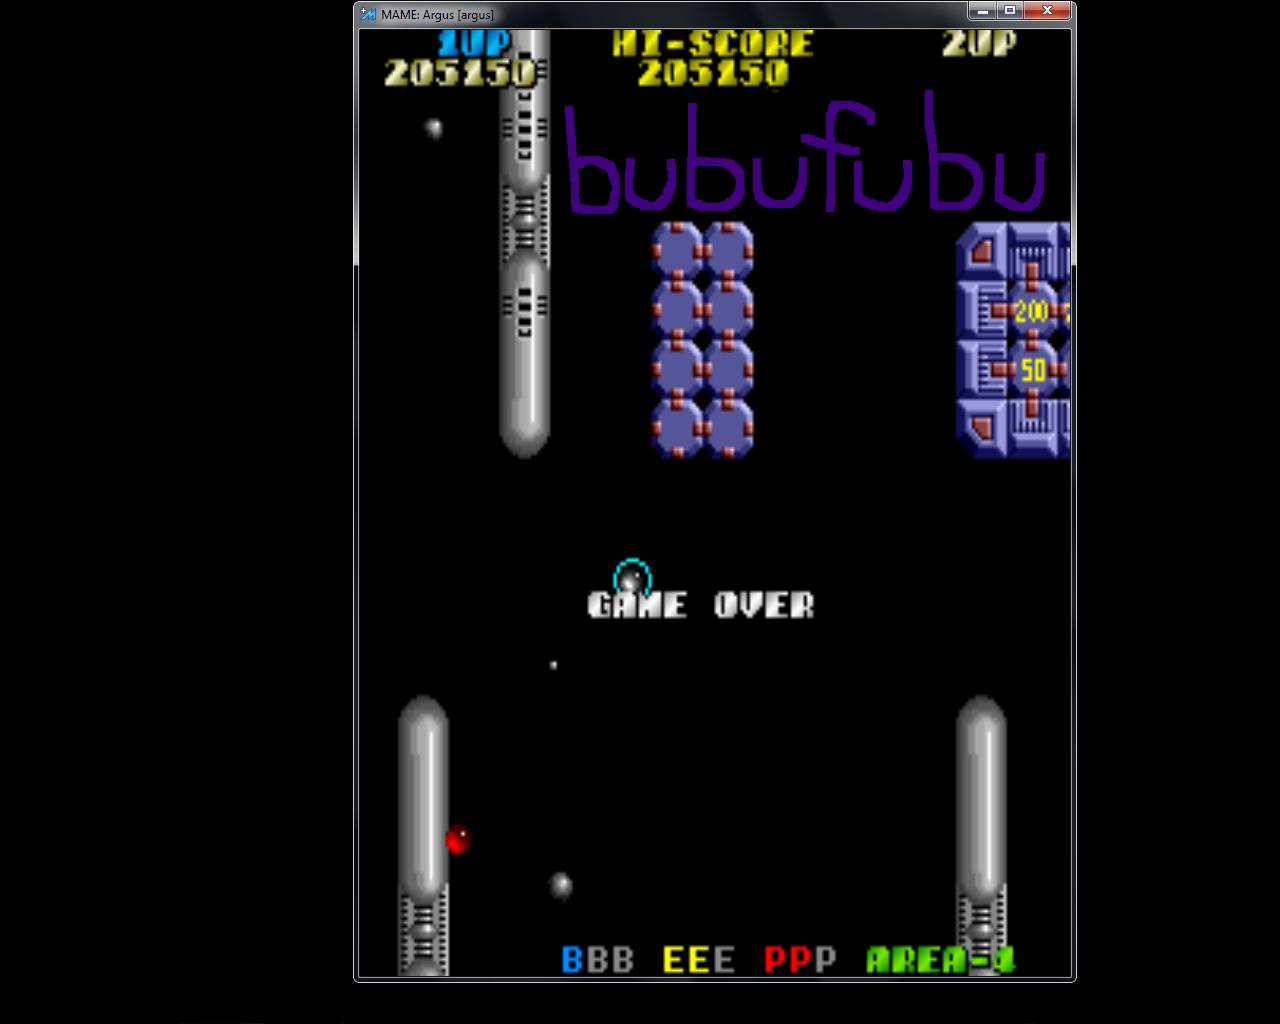 bubufubu: Argus [argus] (Arcade Emulated / M.A.M.E.) 205,150 points on 2015-07-14 16:08:21